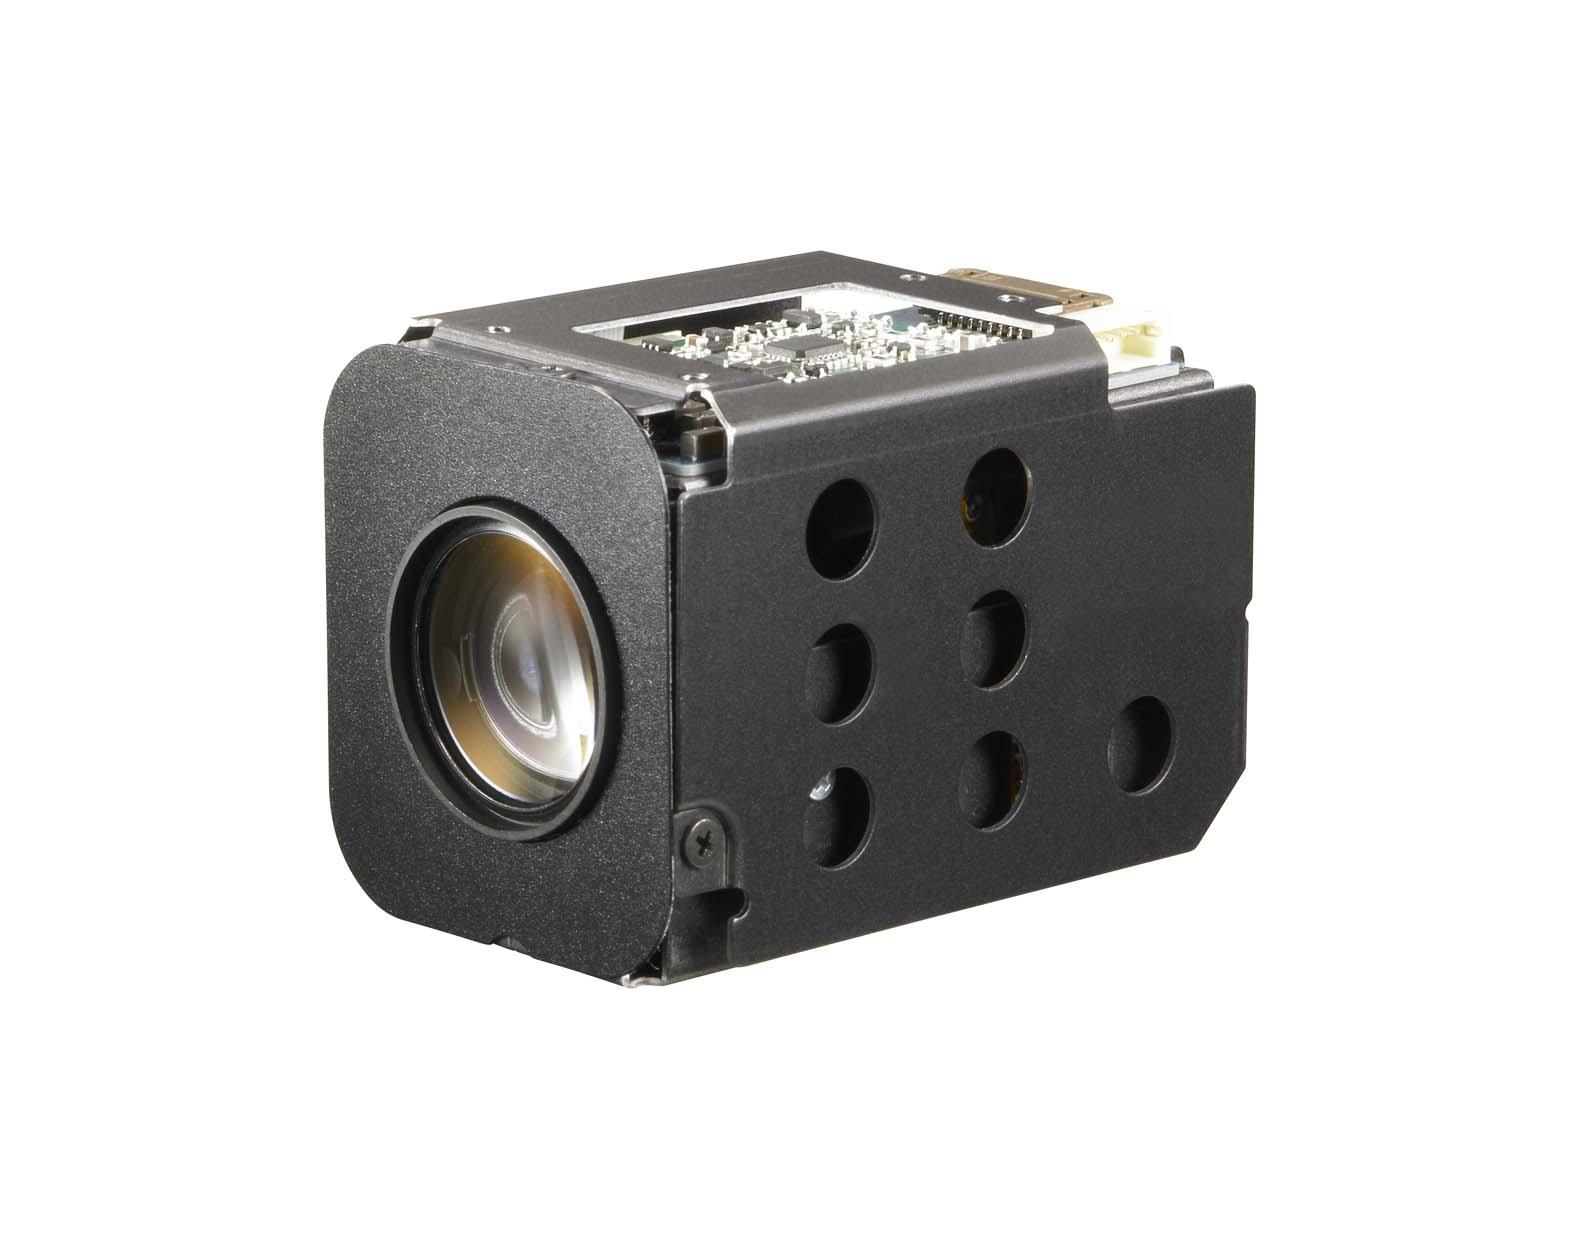 CCTV Sony Camera Zoom Module FCB-EX11DP Colour